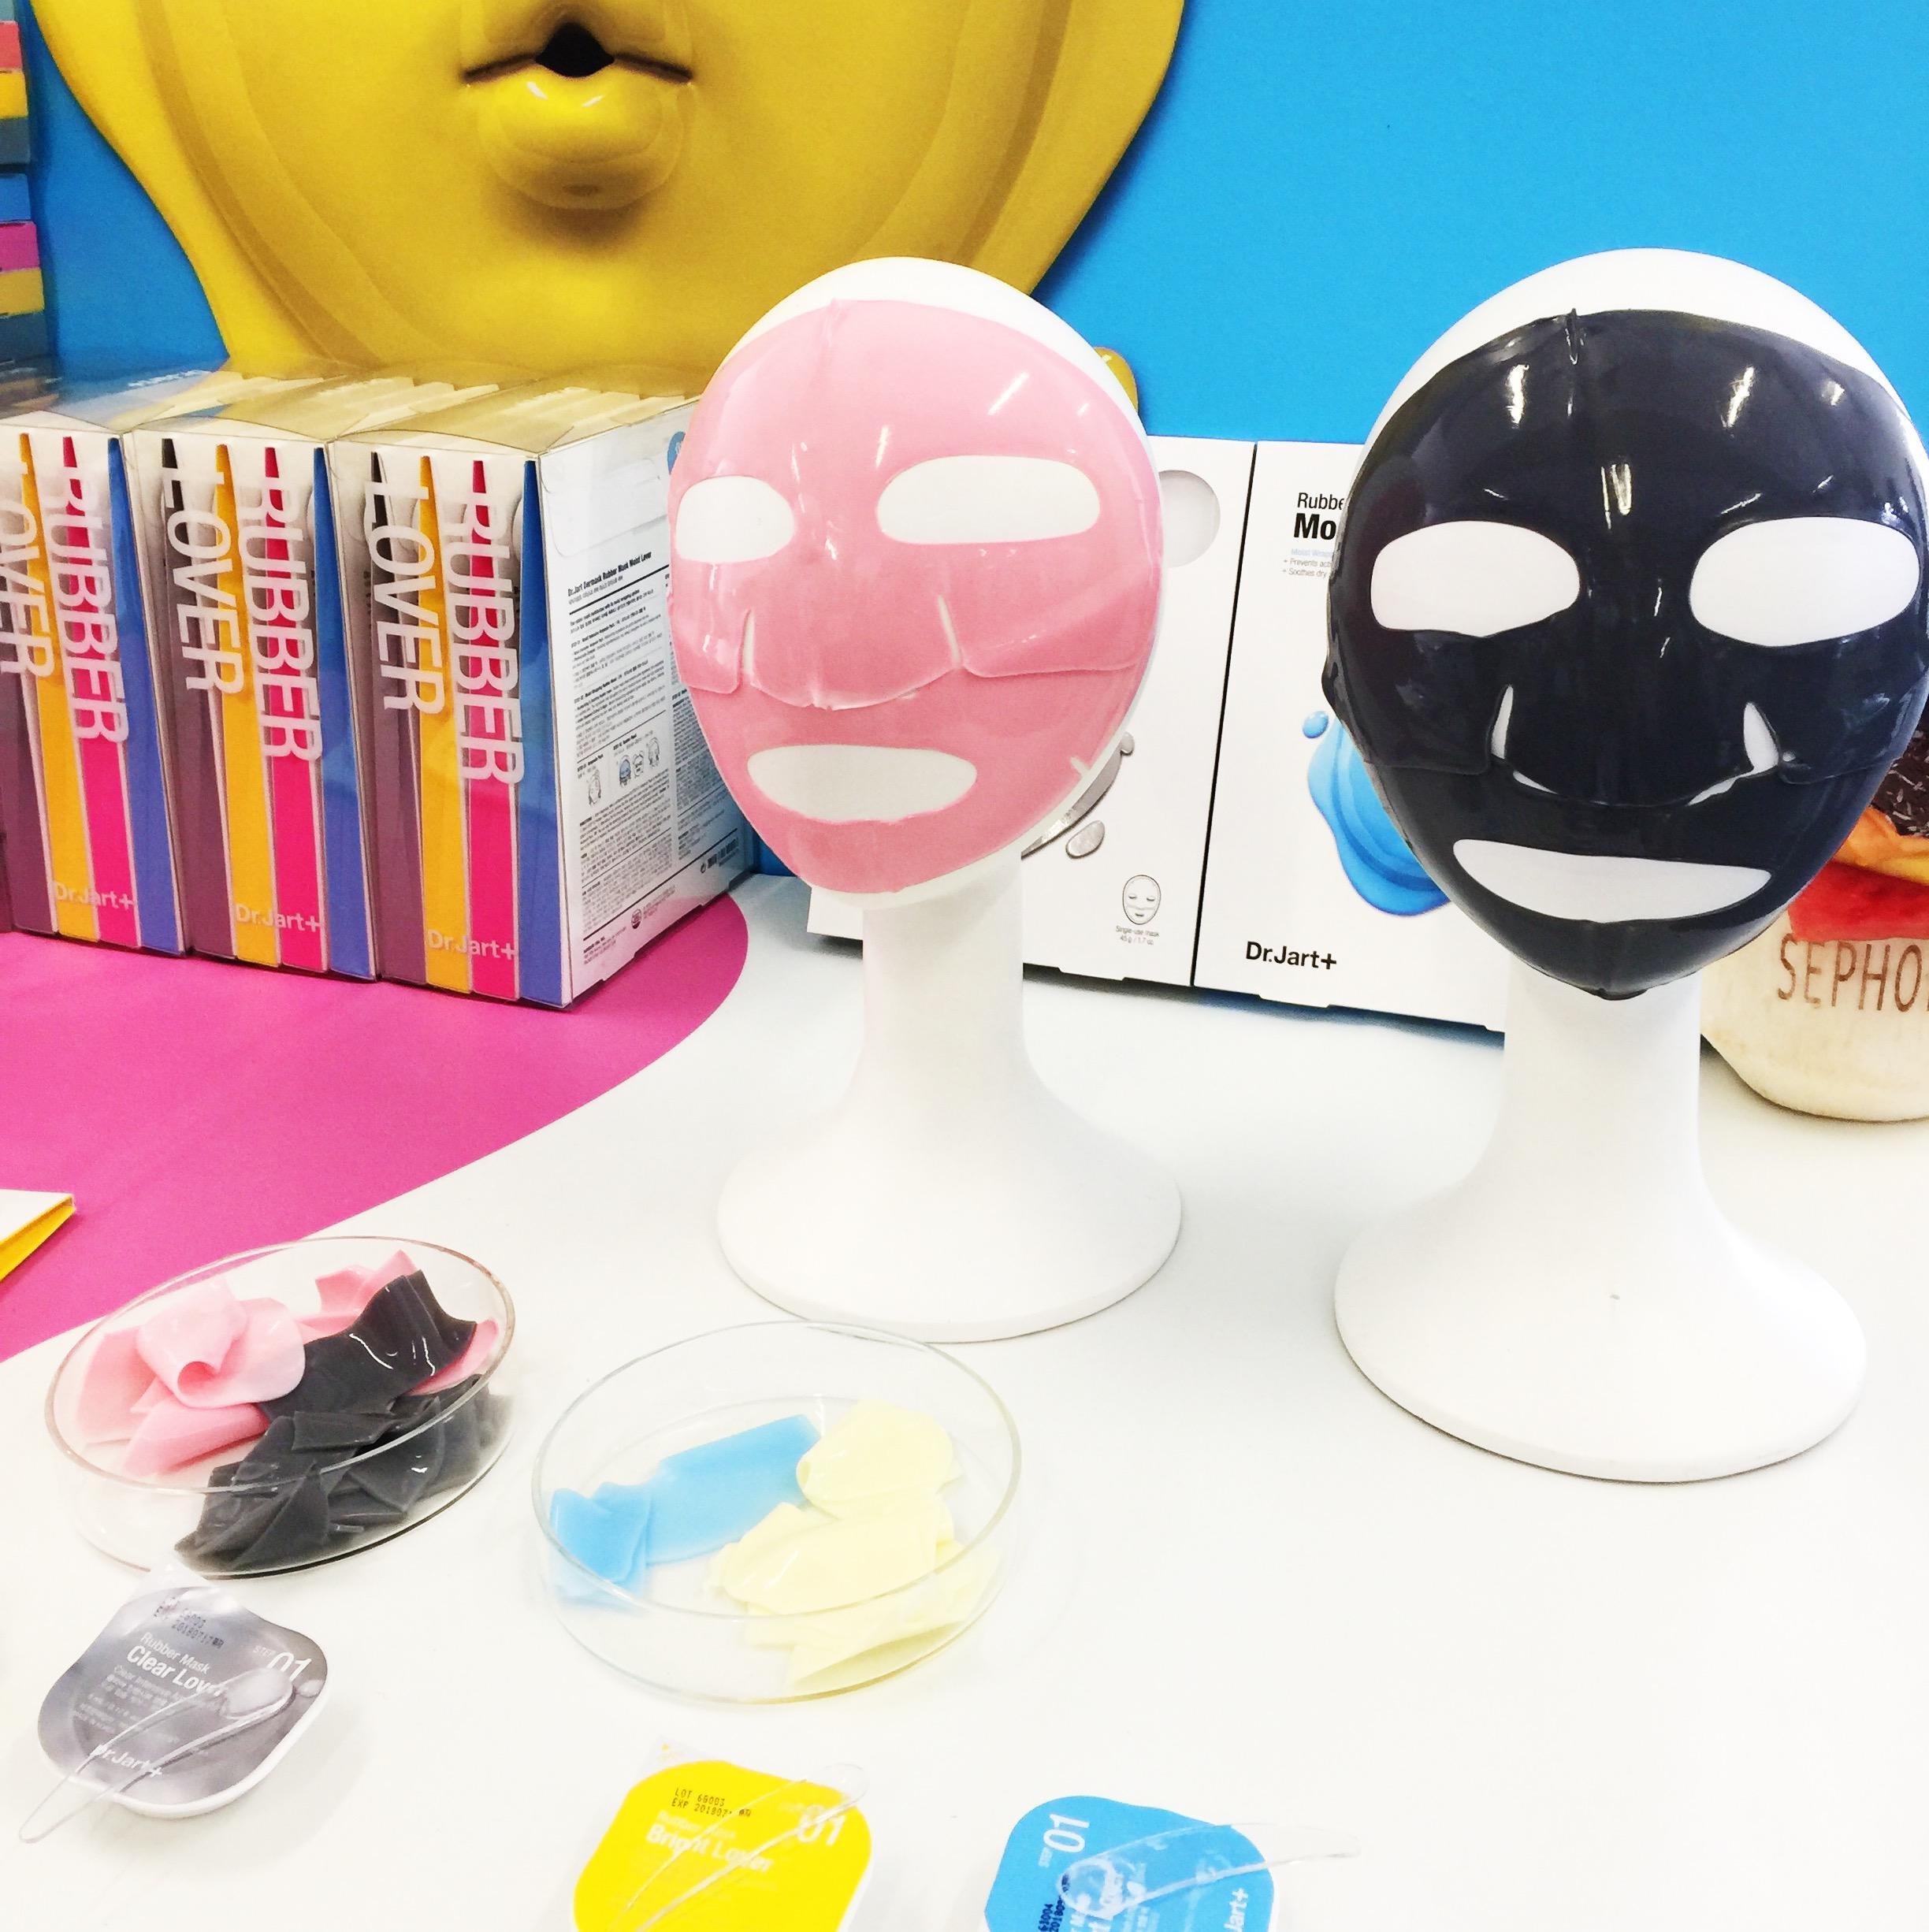 Marisa Robinson Beauty Blogger Sephora Exclusive Brands Showcase 2017 Dr Jart